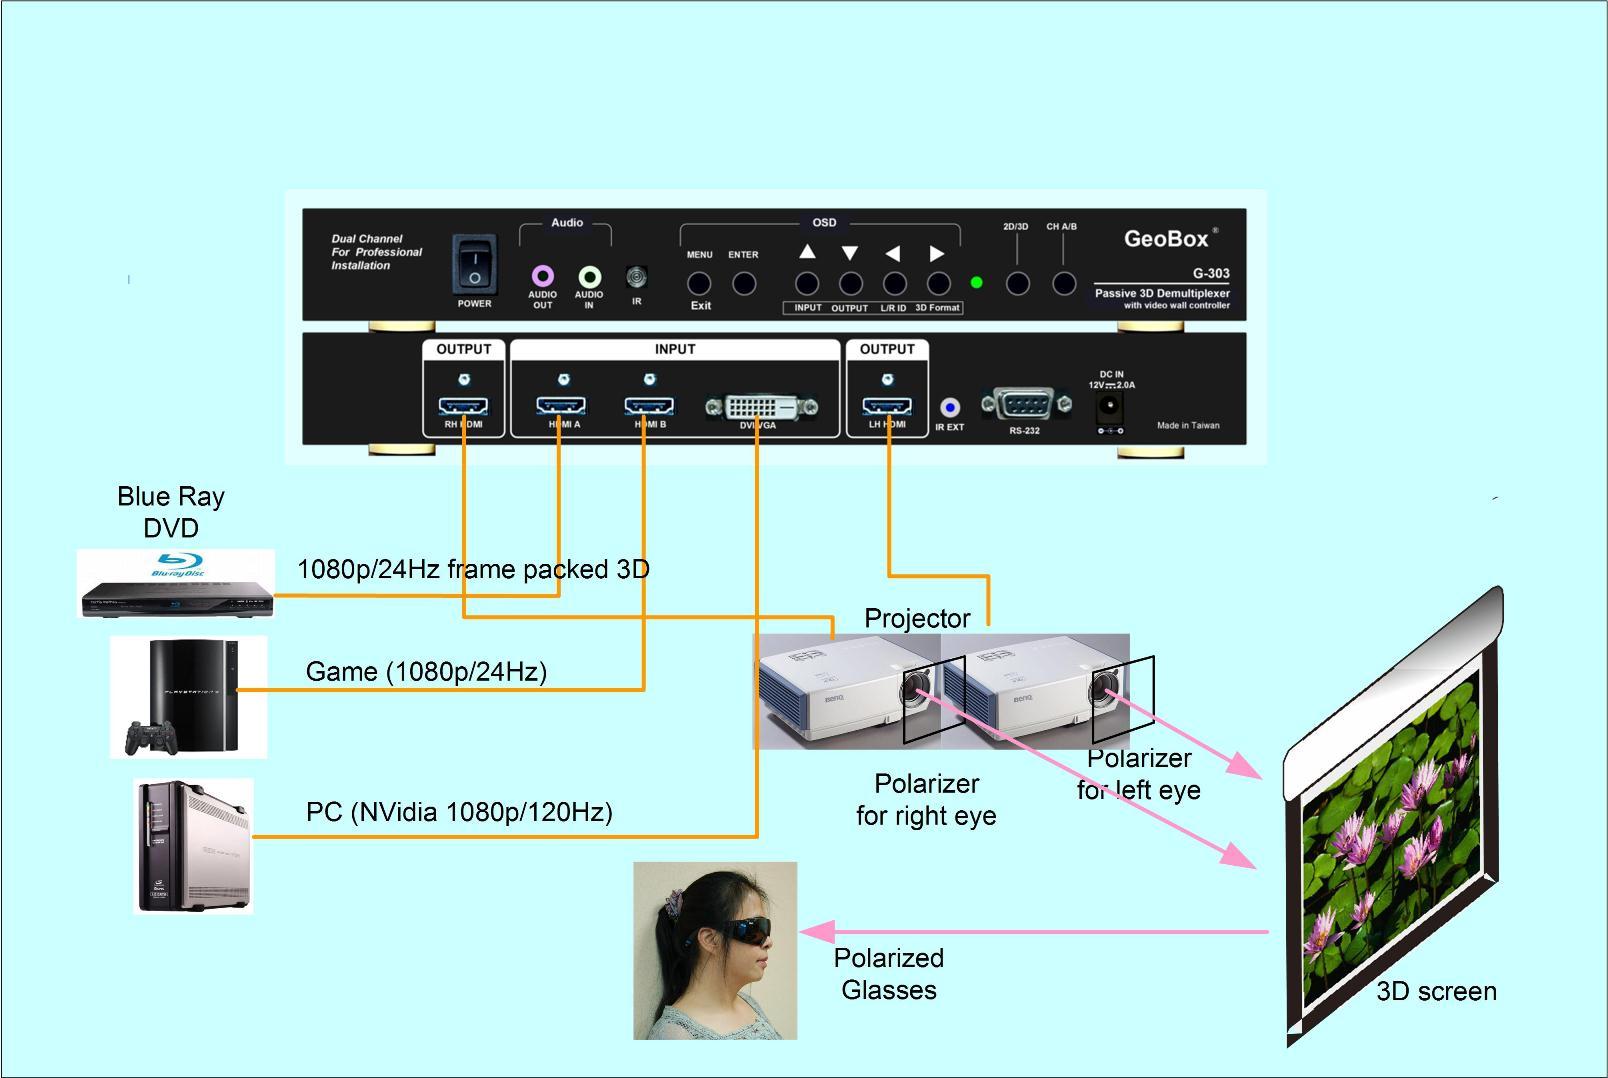 G-303 Dual Channel Professiona Active/passive 3d Processor